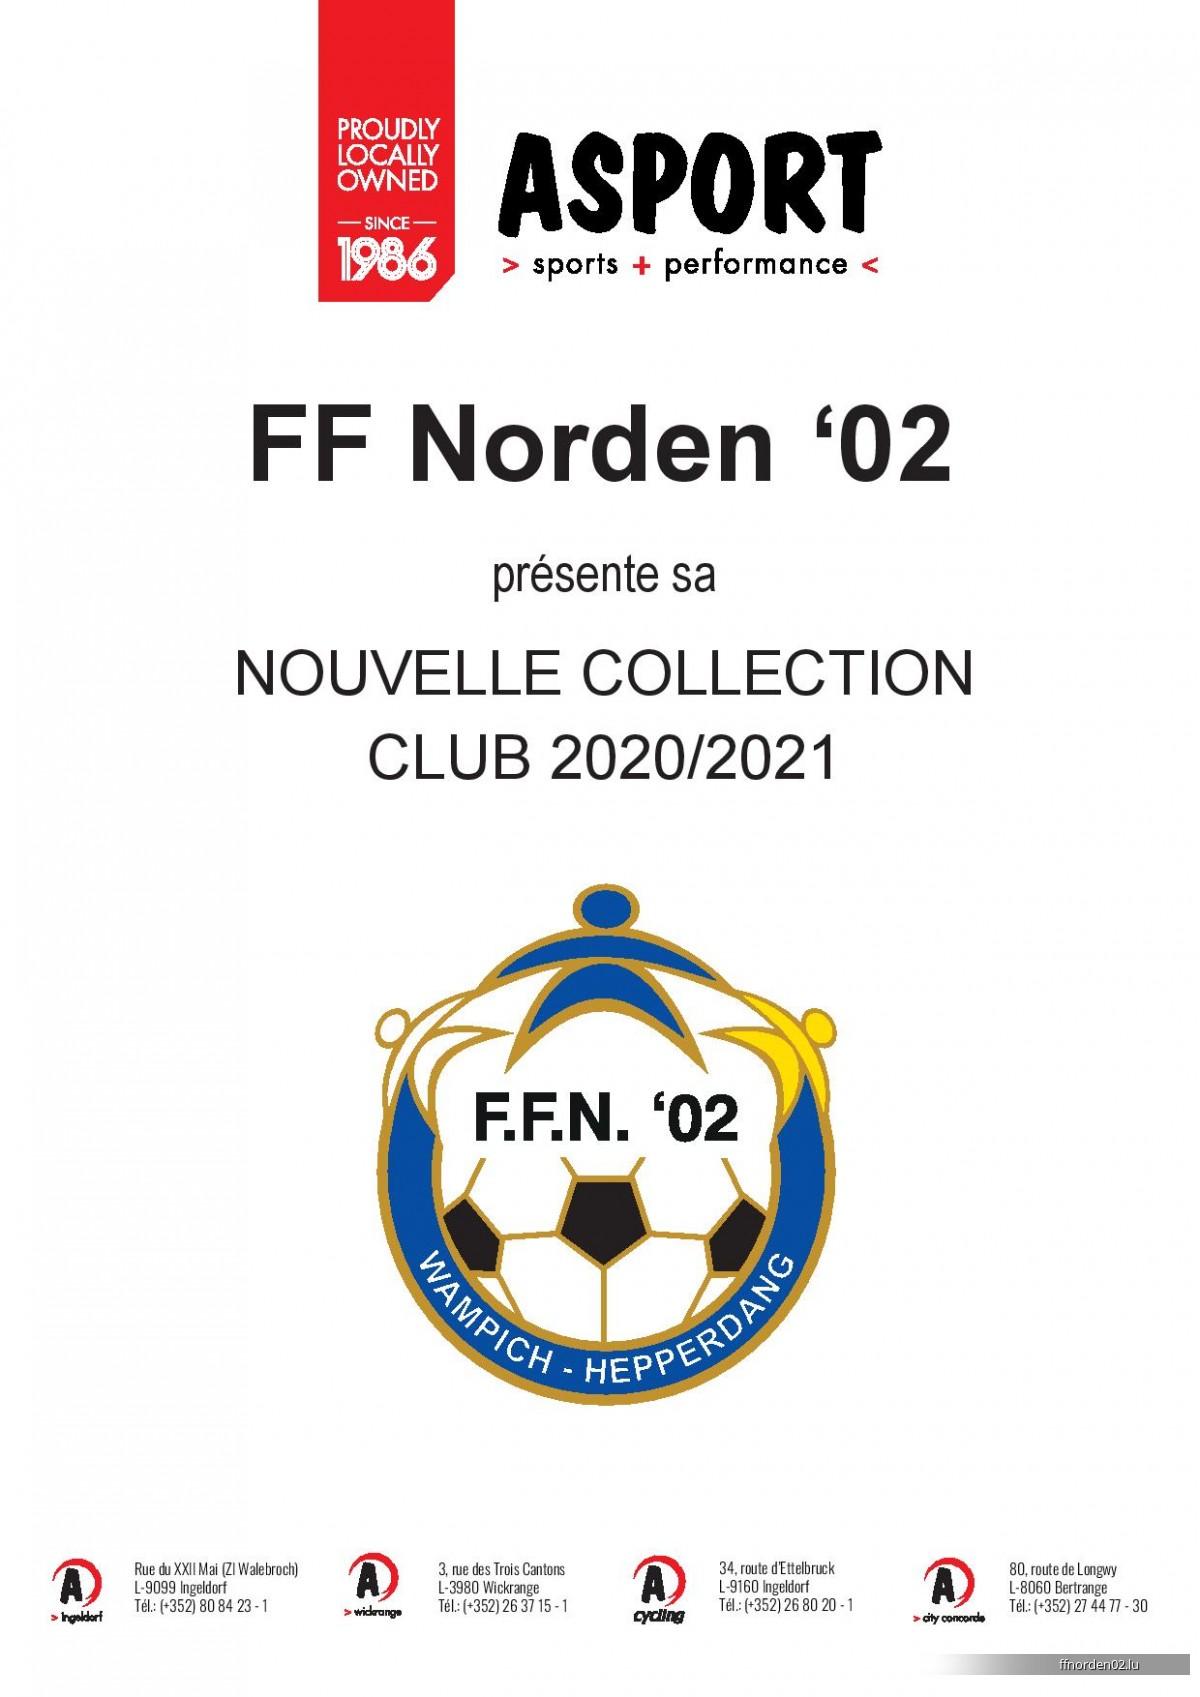 FF Norden 02 Kollektion 2019/2020